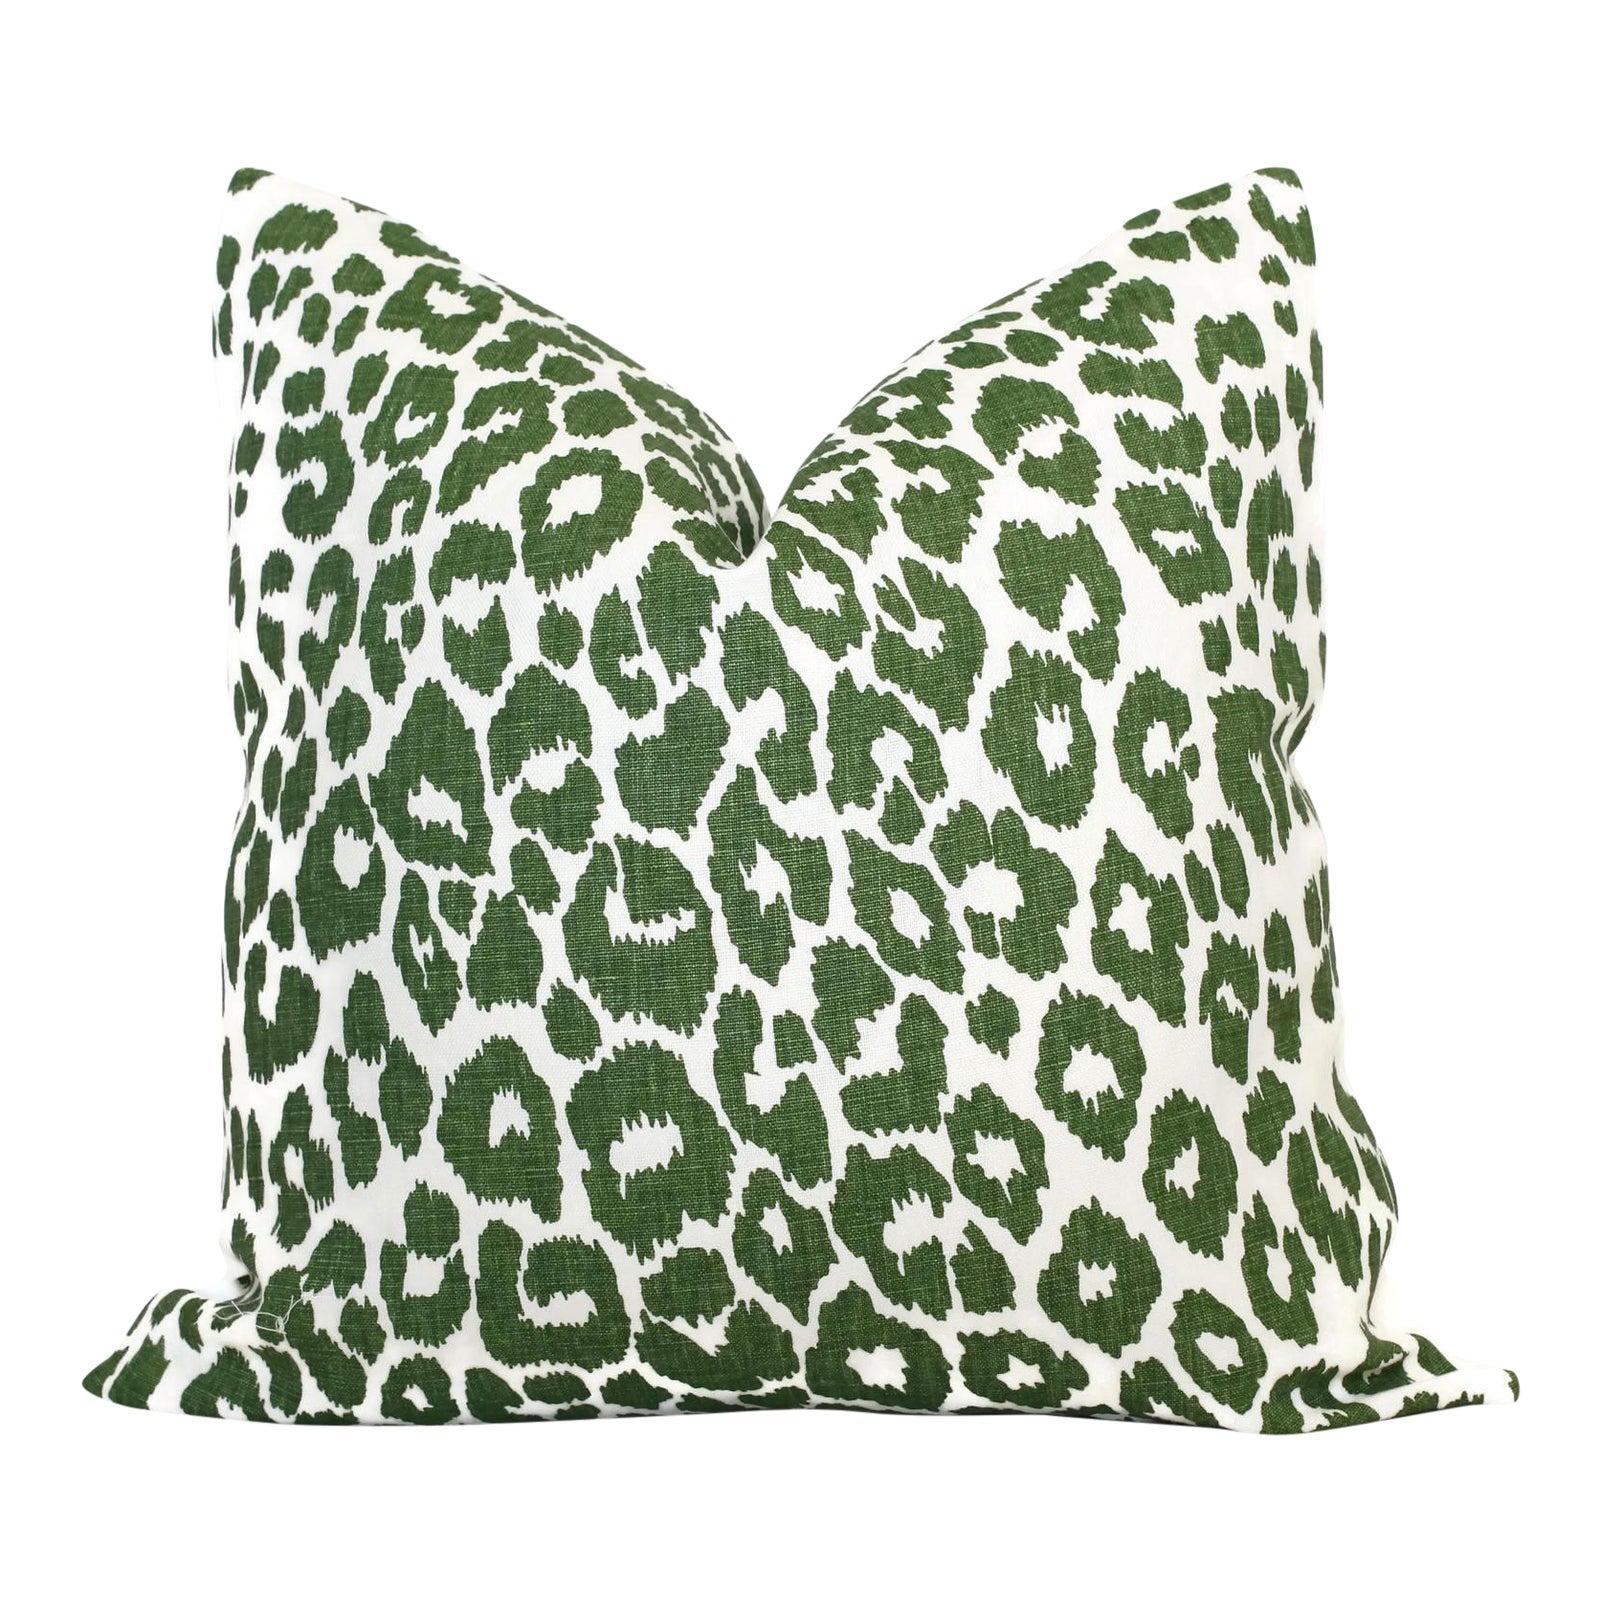 20 X 20 Schumacher Leopard In Green Decorative Pillow Cover Chairish